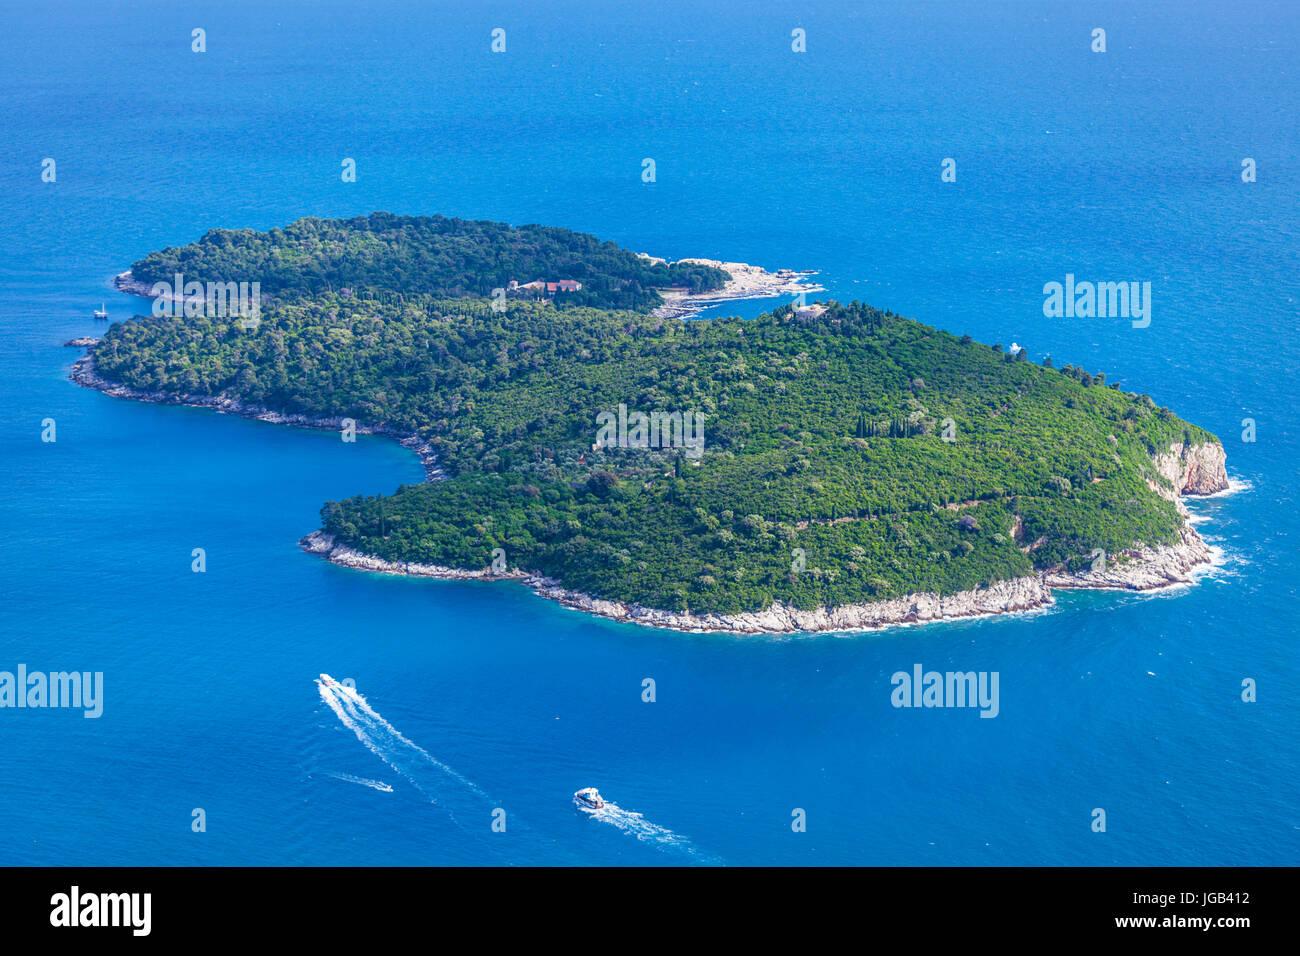 Croatia Dubrovnik Croatia Dalmatian coast aerial view of ferries going to  Lokrum island dubrovnik  Adriatic sea - Stock Image